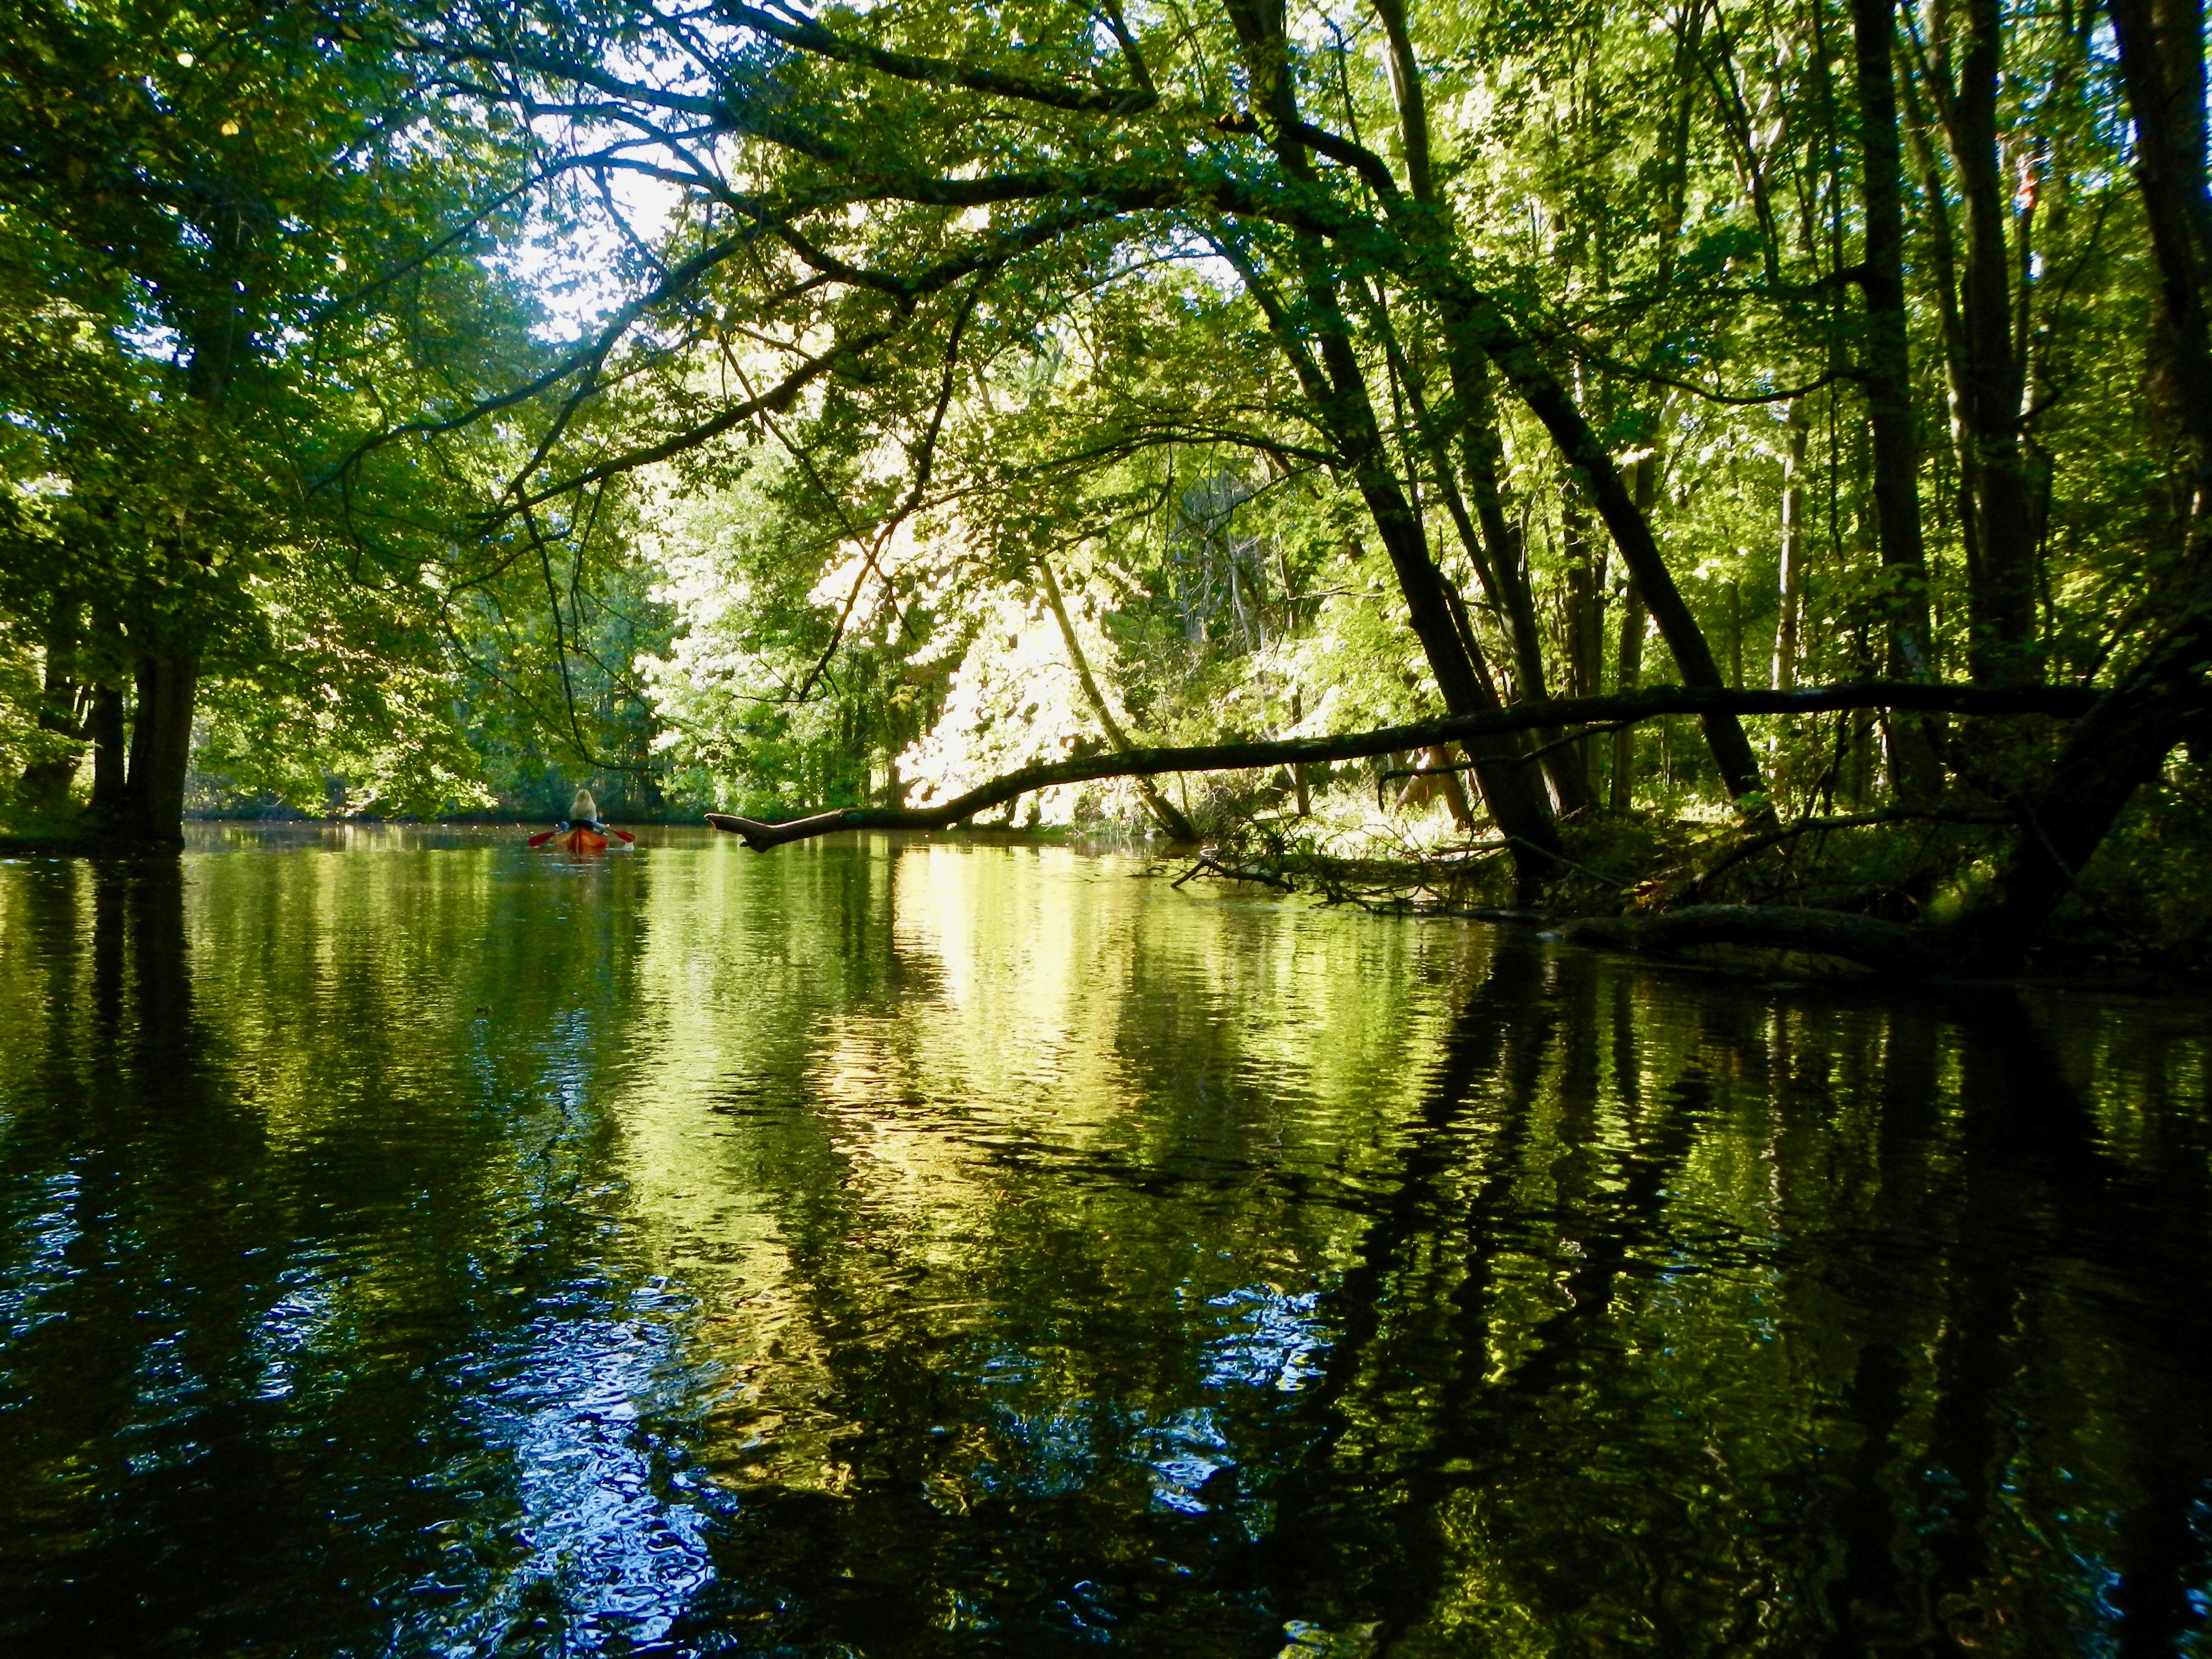 shady-green-bows-over-rogue-river